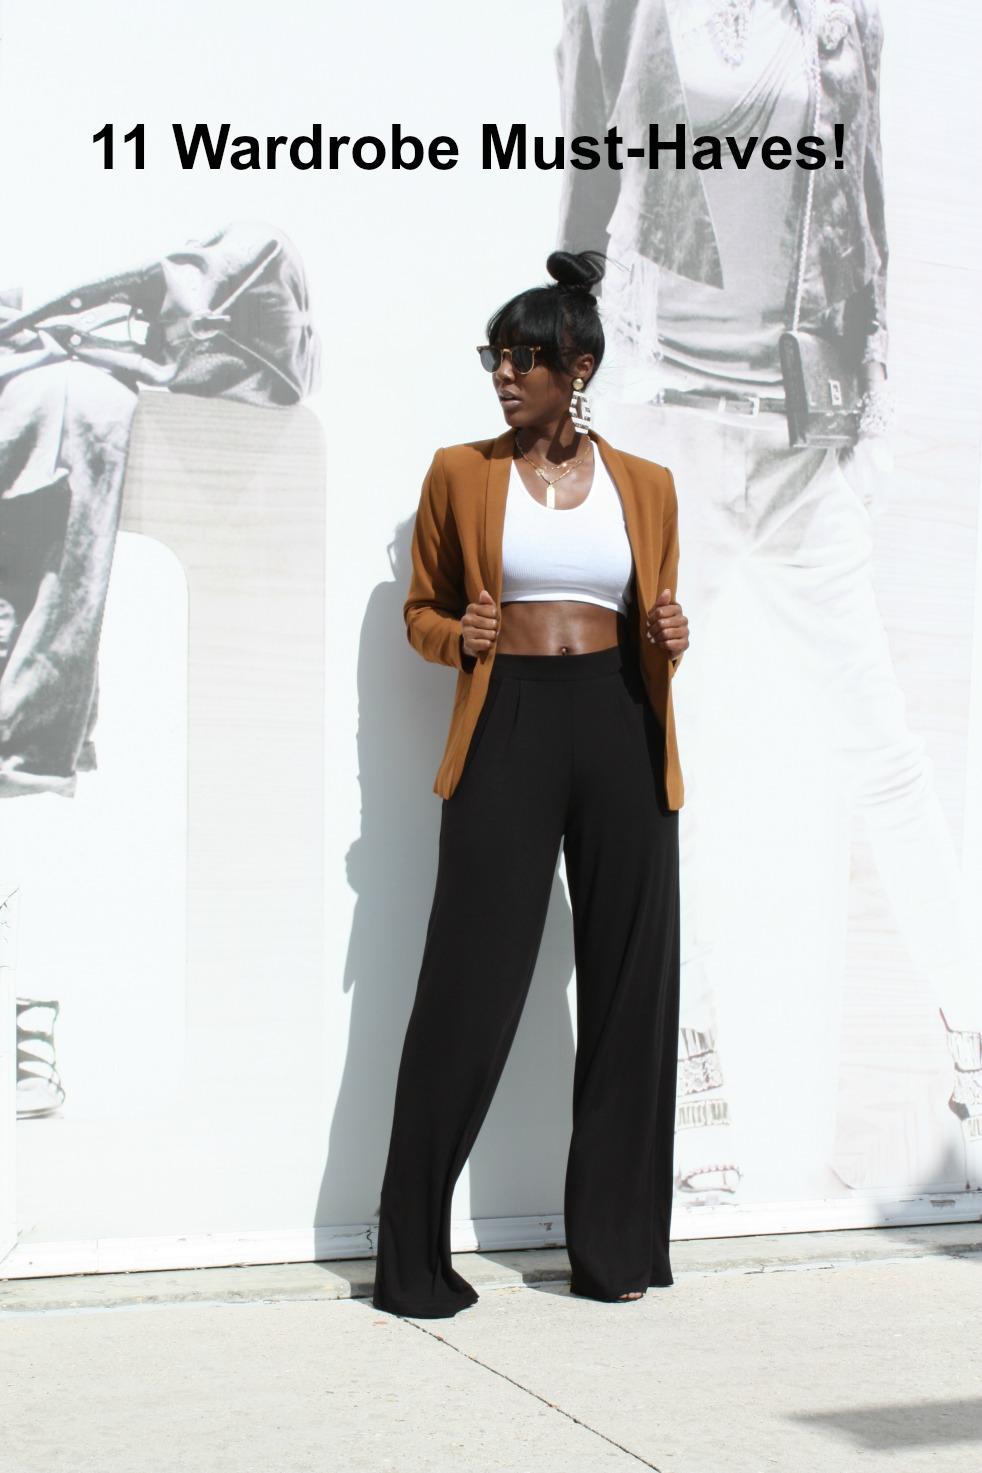 11 Wardrobe Must-Haves